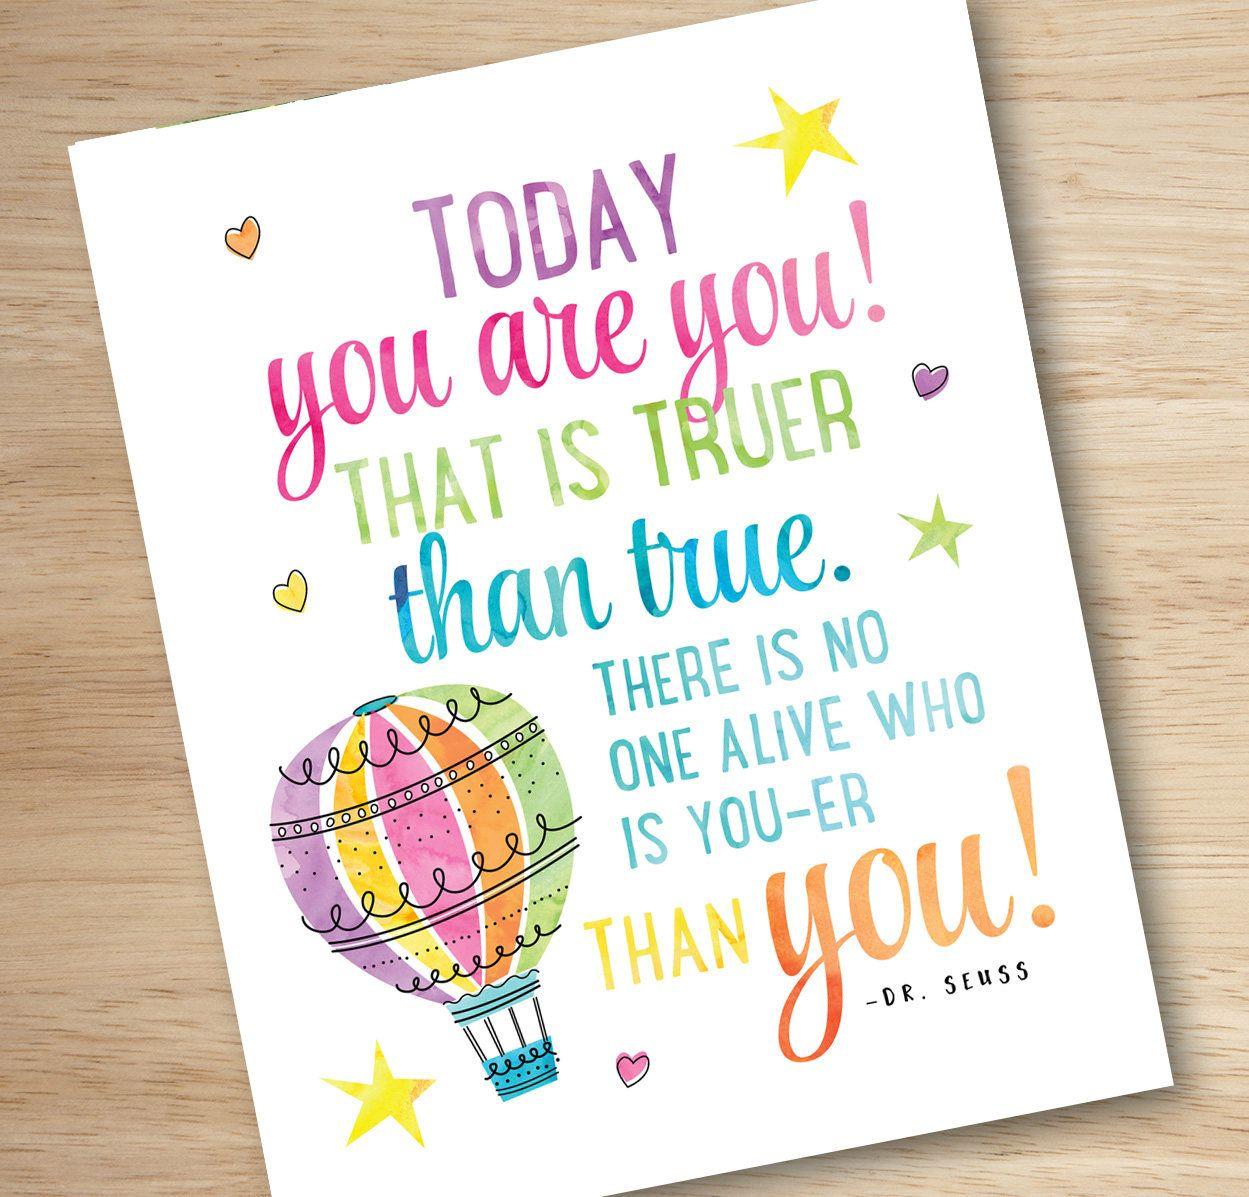 Dr Seuss Print, Today You Are You, Dr. Seuss Wall Art, Dr. Seuss Quote,  Rainbow Colored Art, Kids Playroom Print, PRINTABLE Kids Art